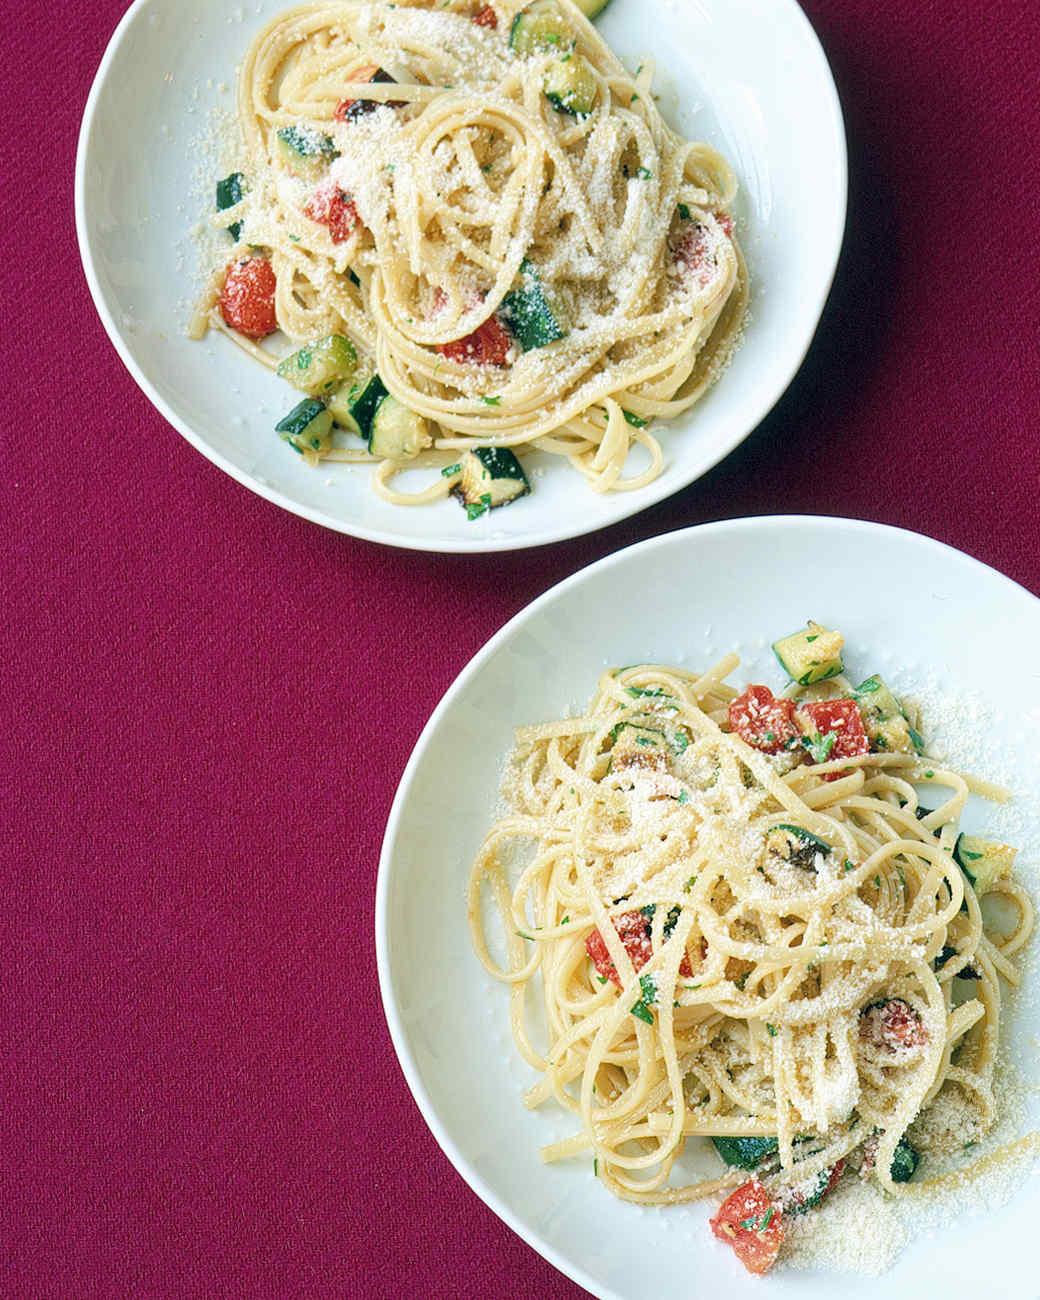 Menu for Roasted Zucchini and Tomato Pasta